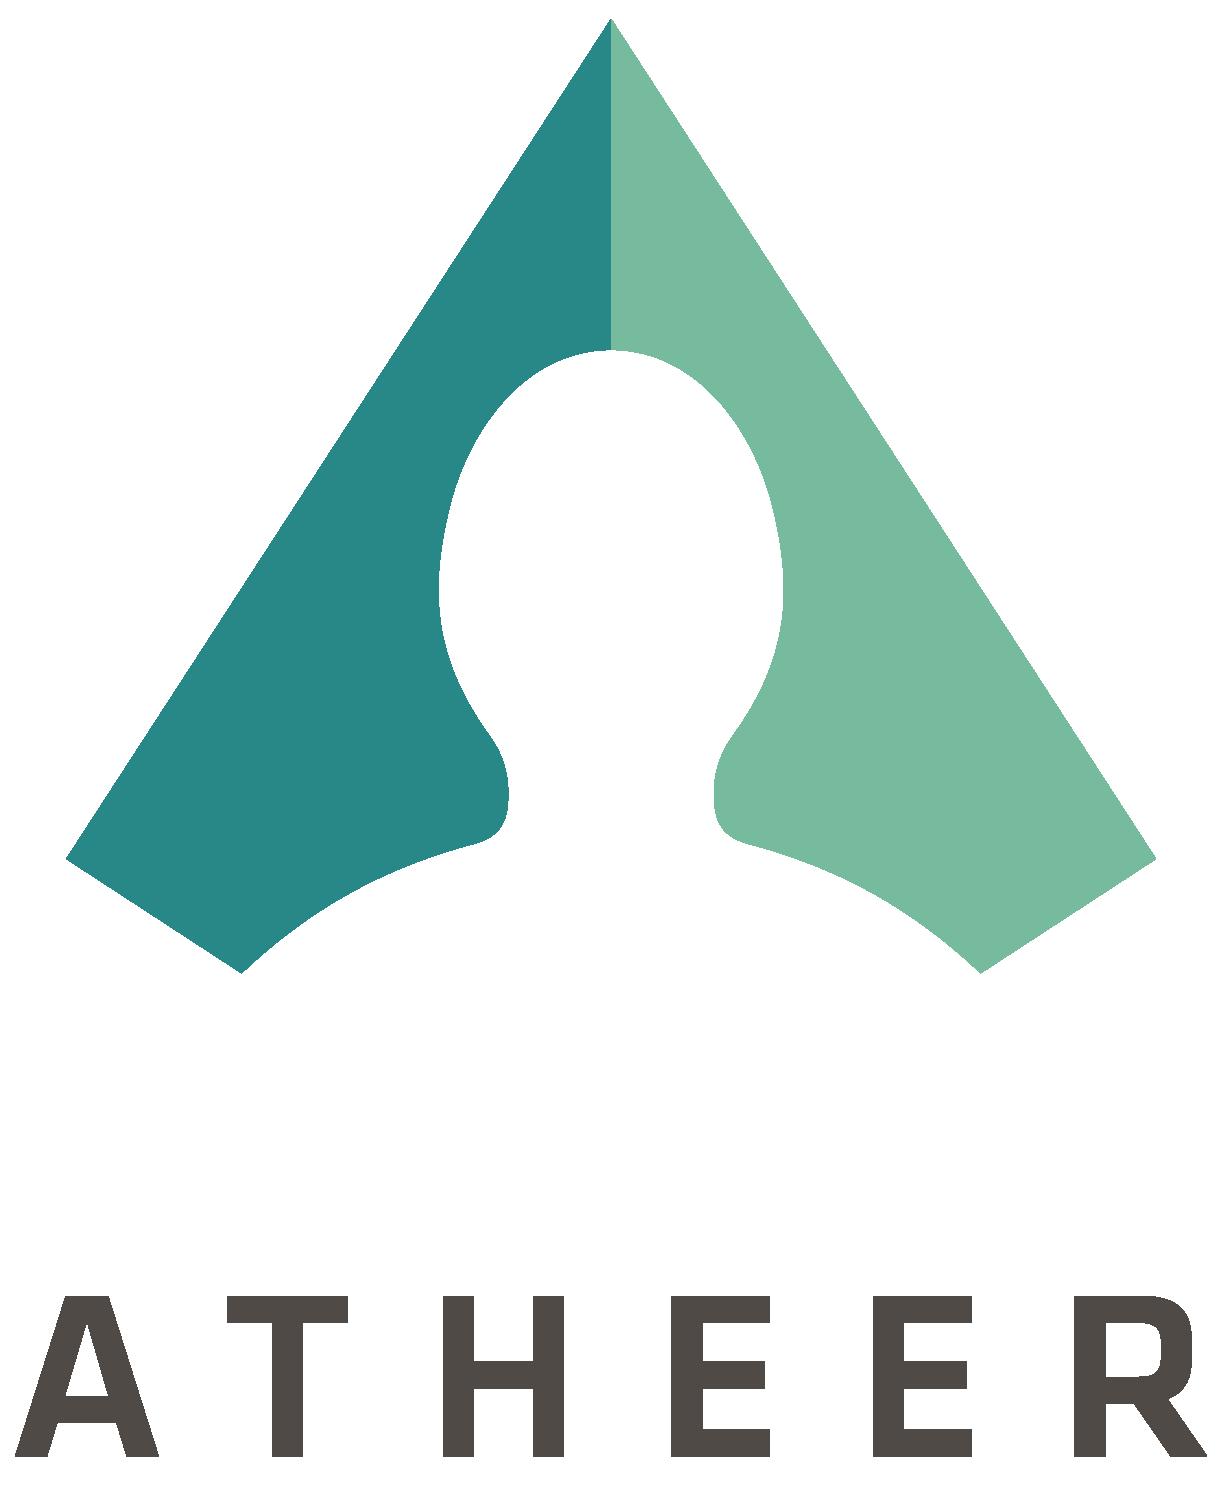 logo(WEB)Vertical_color.png